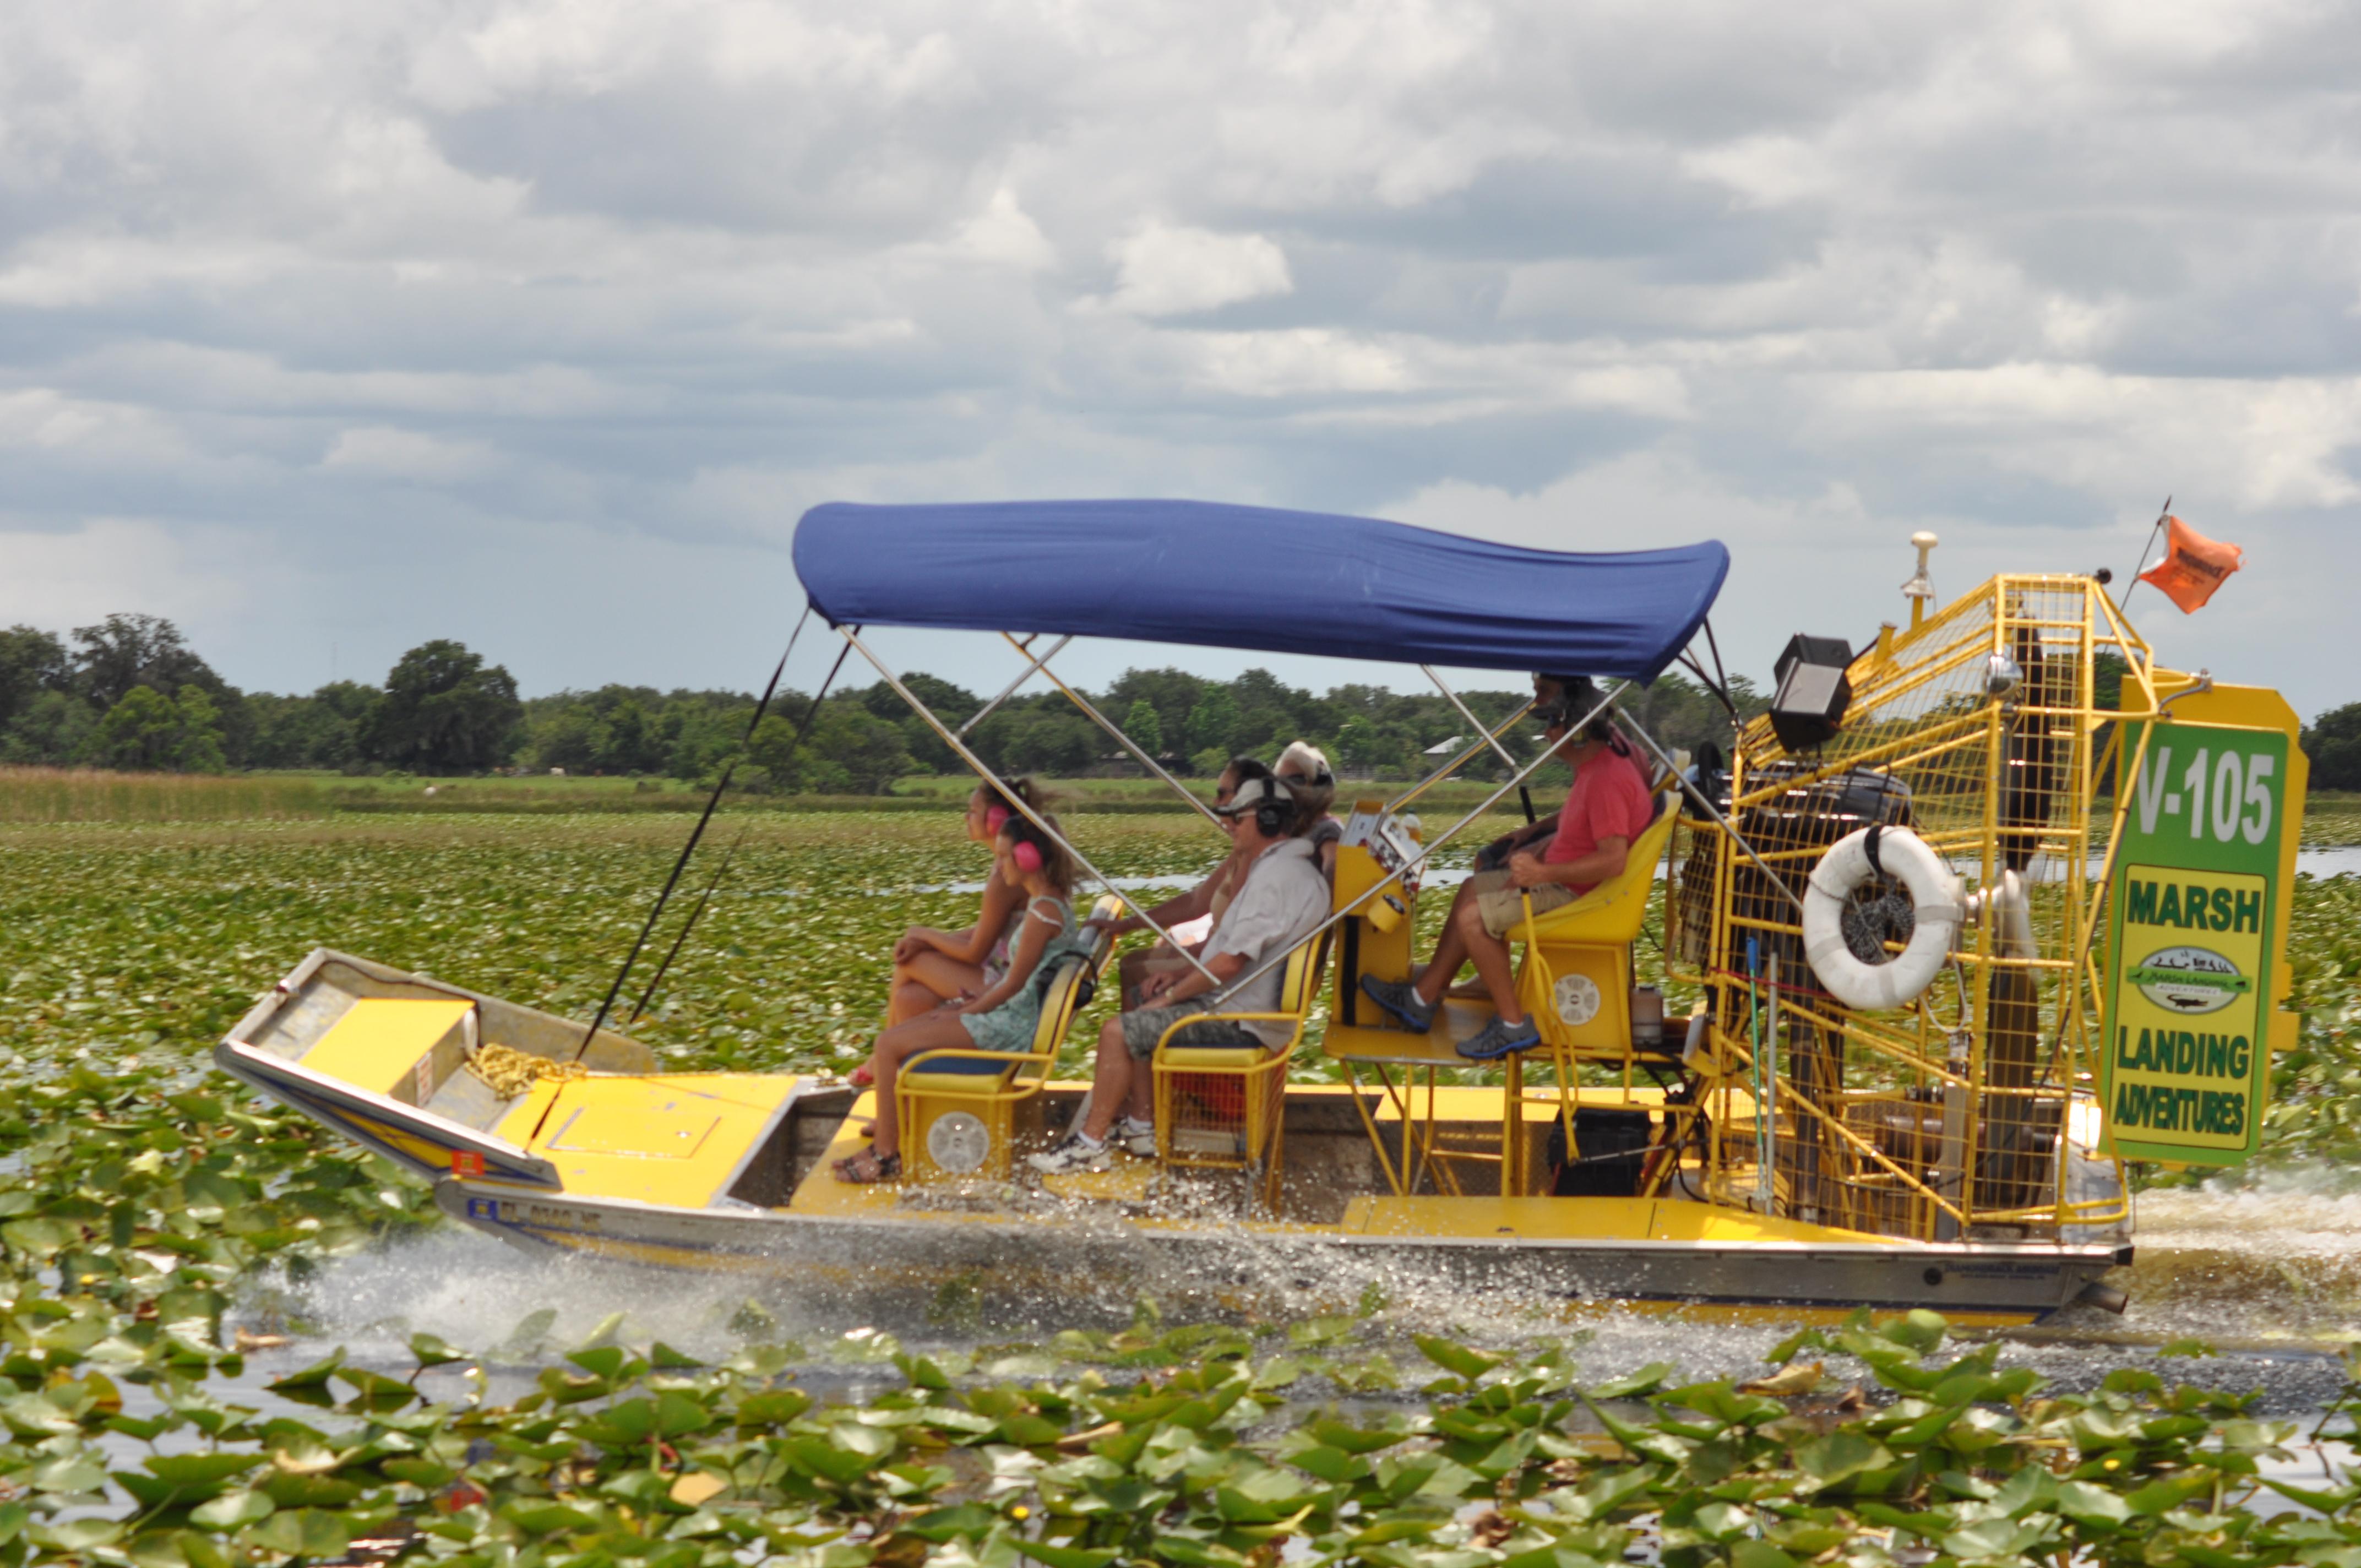 Airboat rides kissimmee swamp tours : Travel williamsburg va